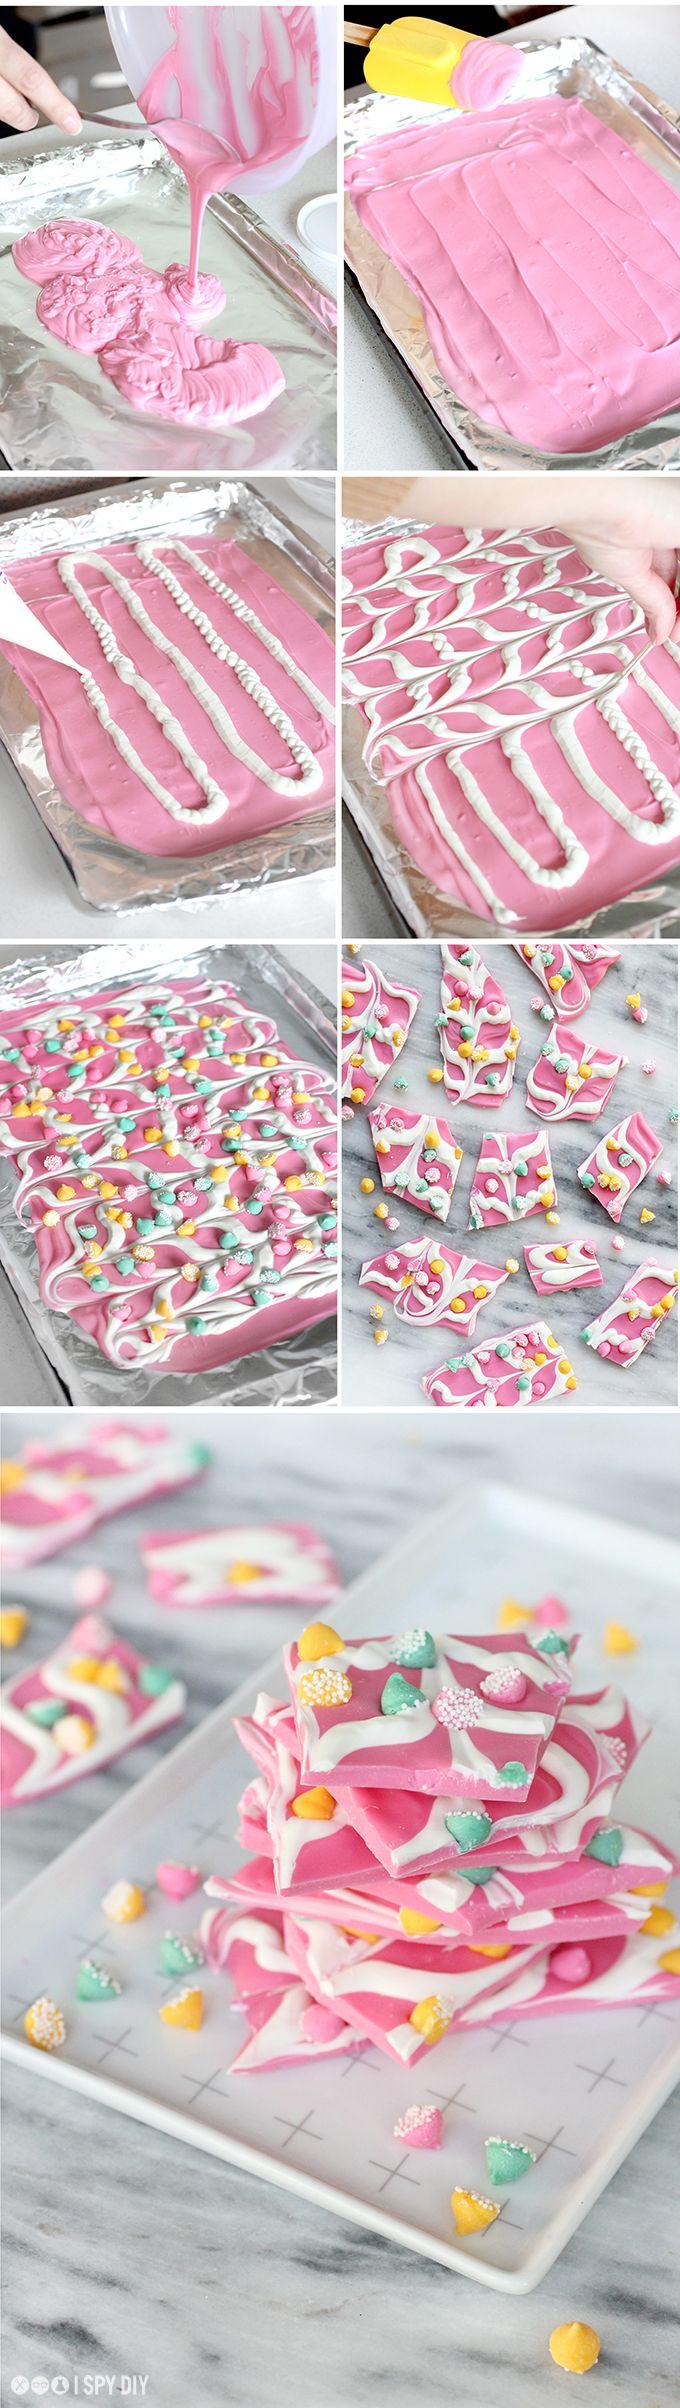 Steps Pink Mint Chip Chocolate Bark ŧyaandiig Fōōd Chocolate